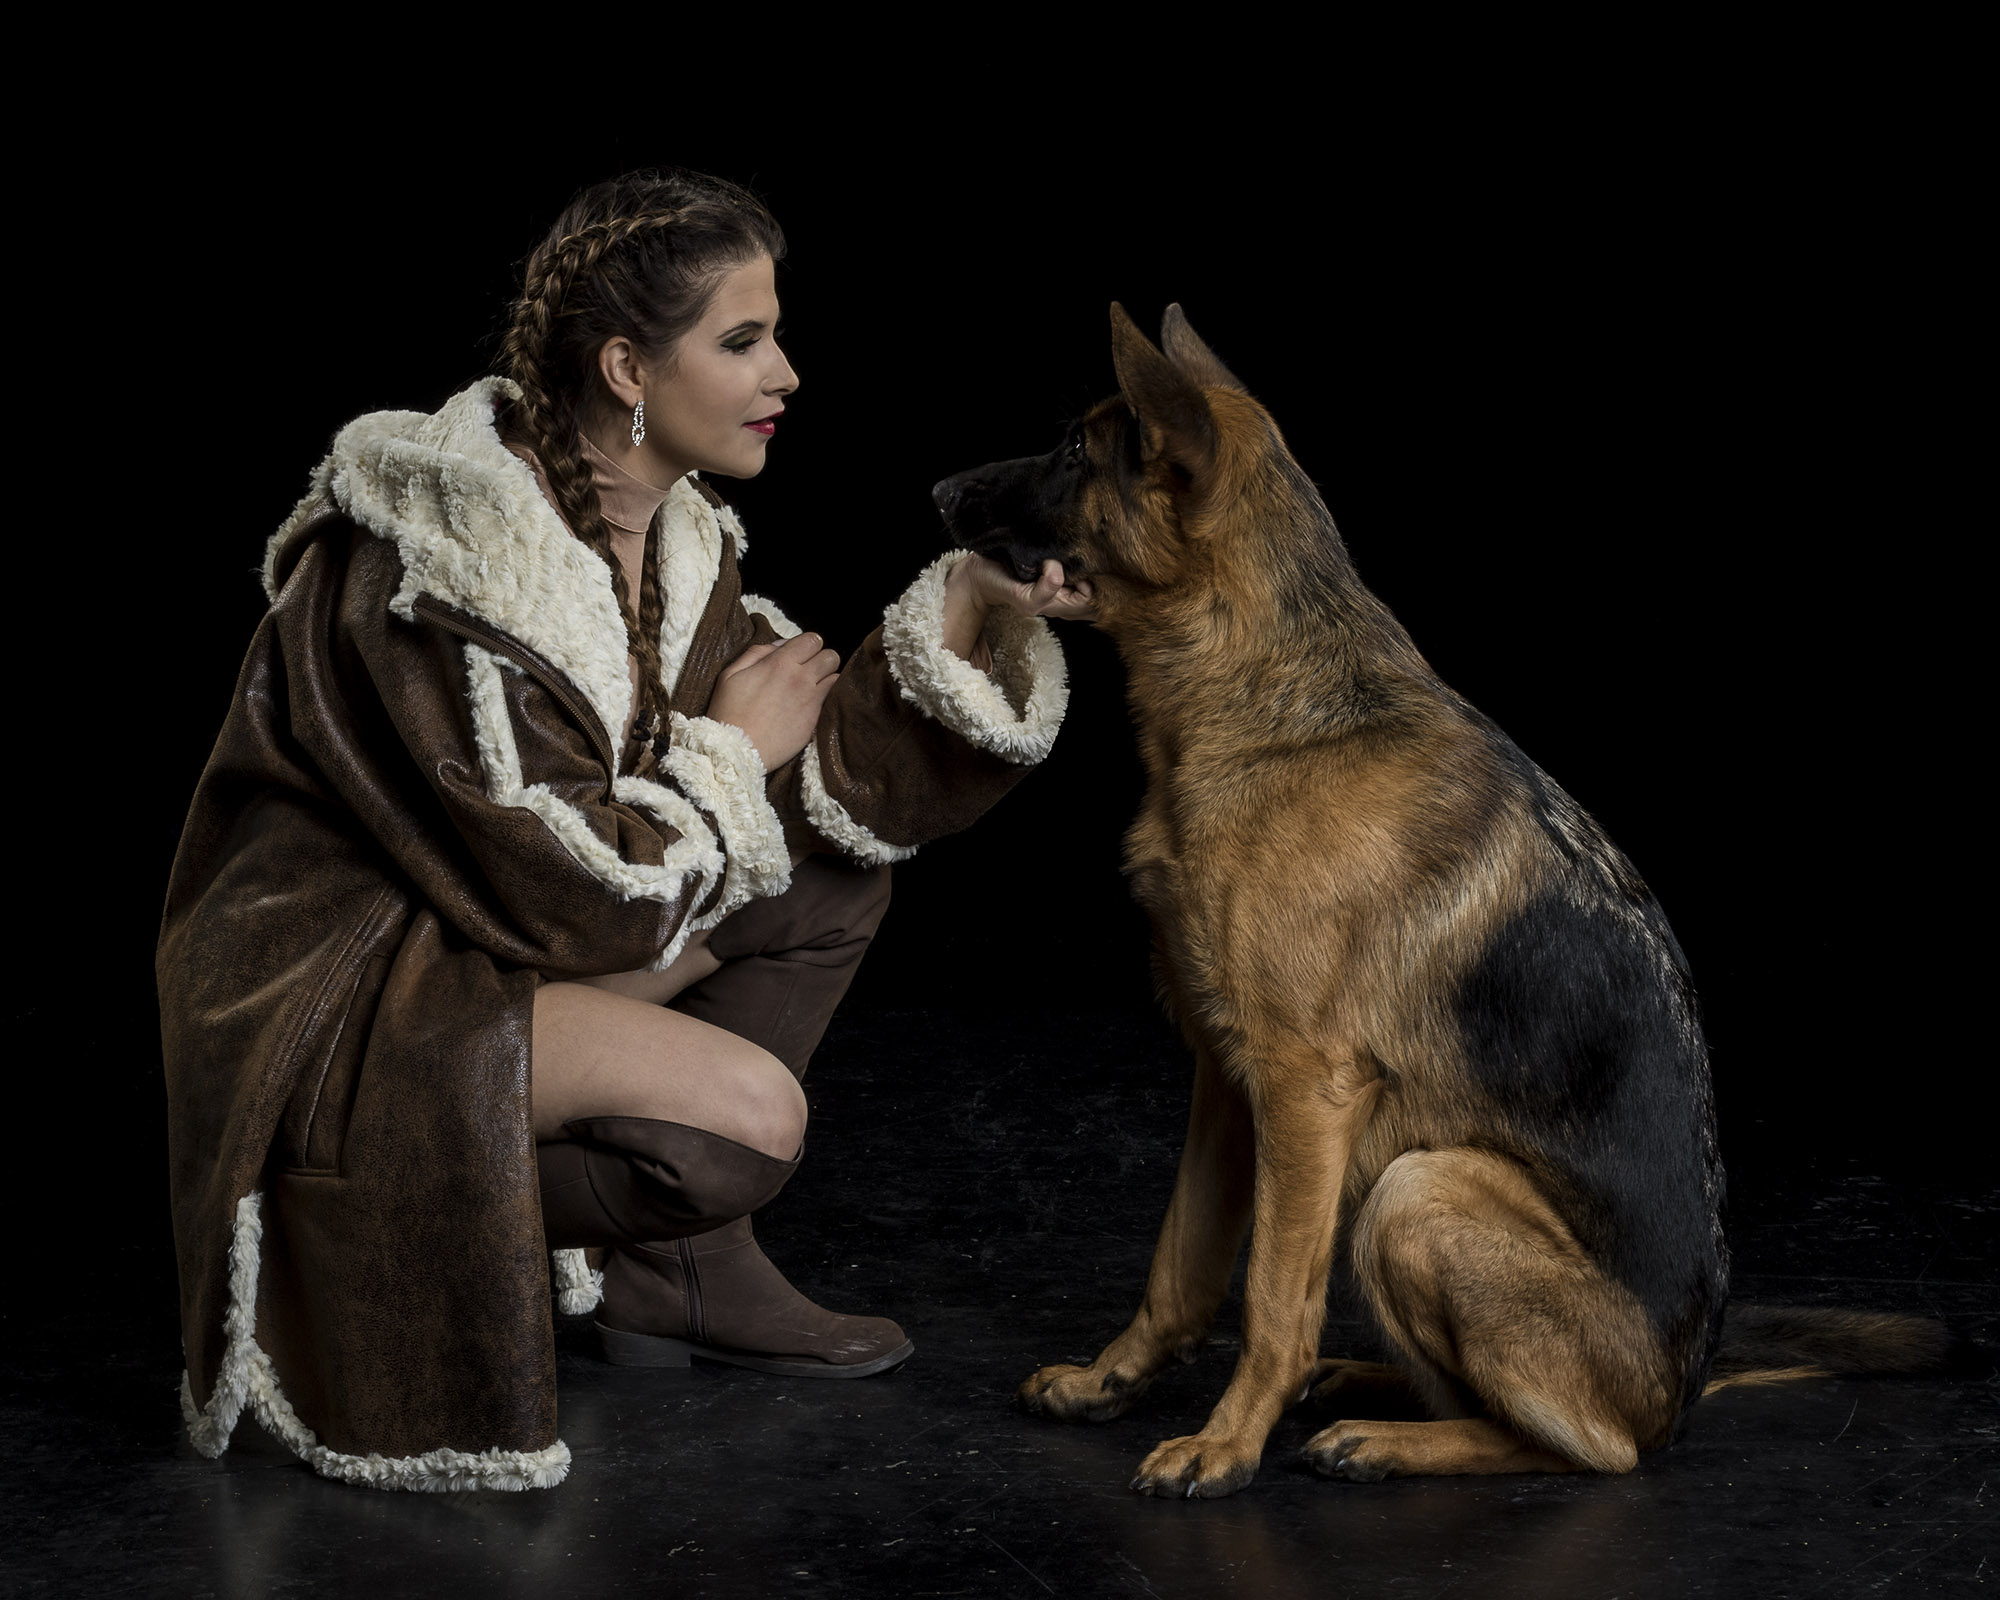 german shepherd dog - pet photography - london ontario